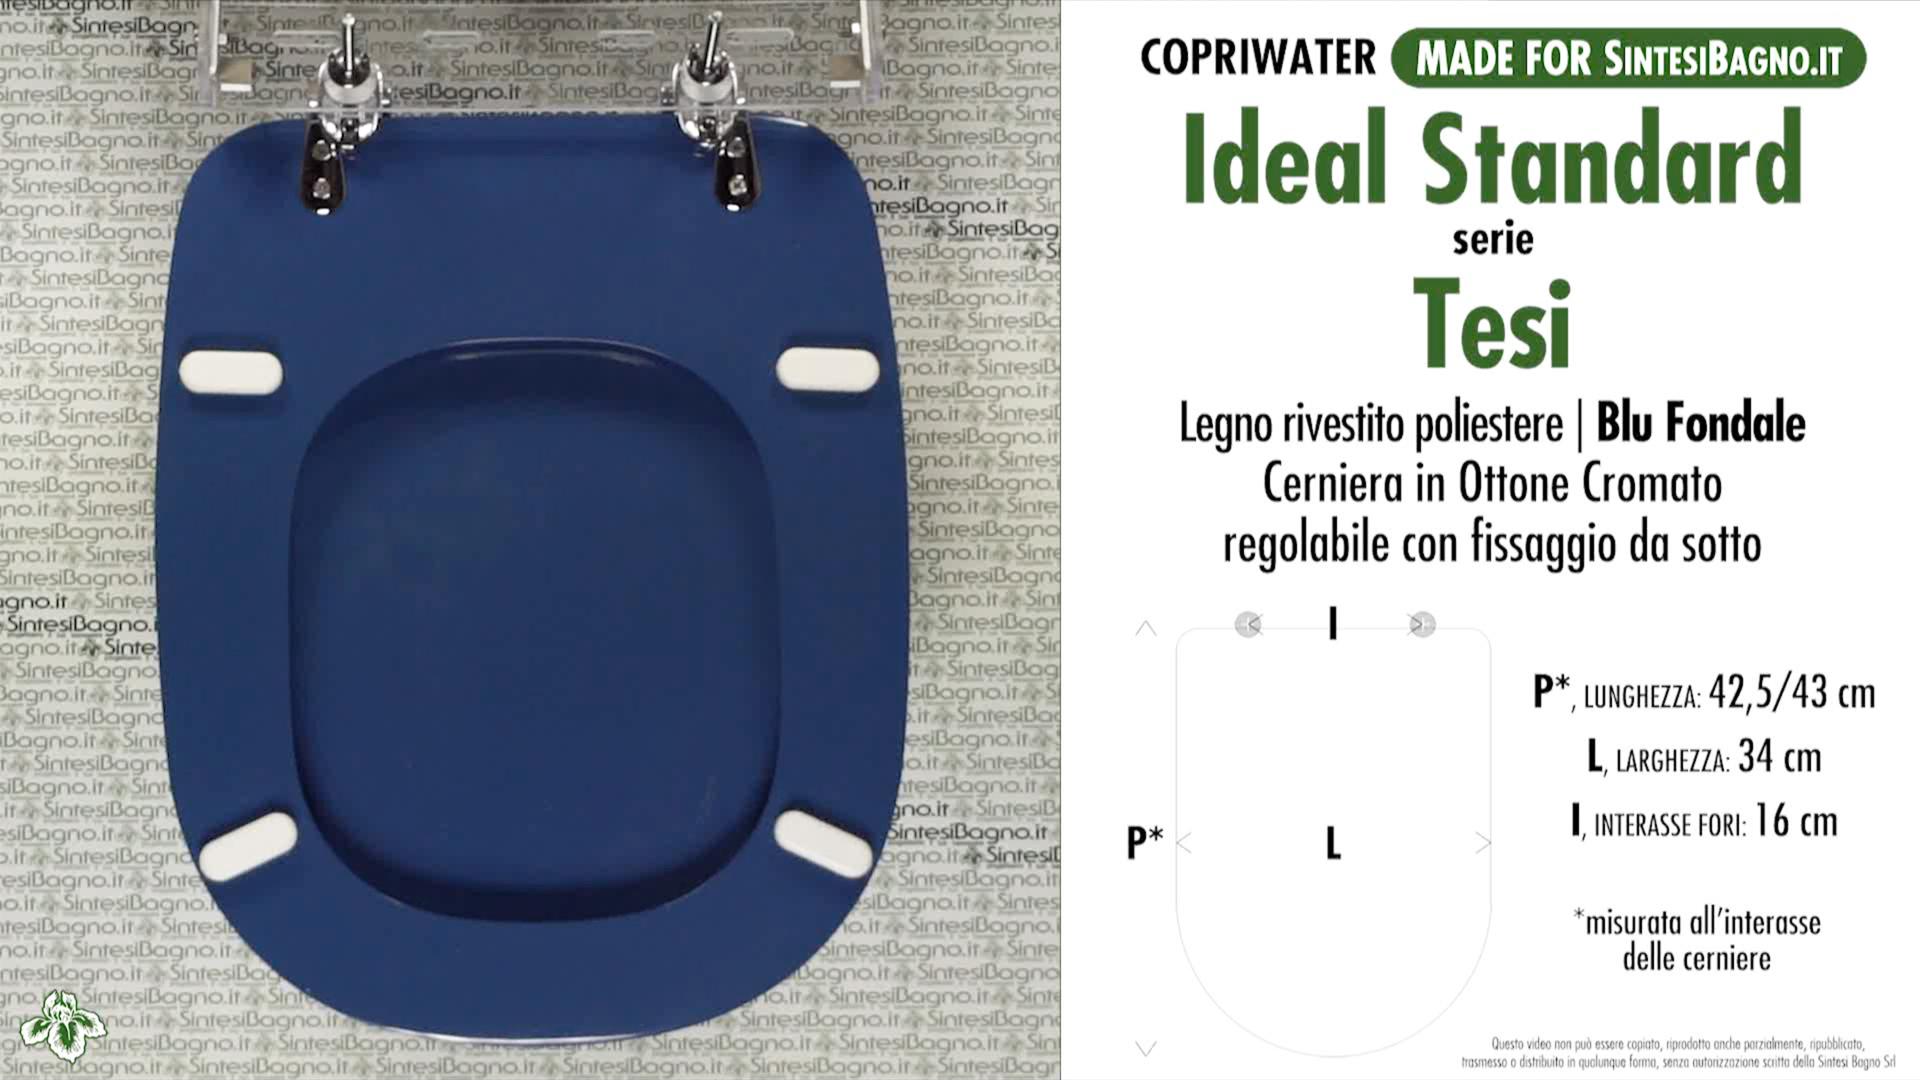 Sedile Wc Ideal Standard Serie Tesi.Copriwater Per Wc Tesi Ideal Standard Fondale Ricambio Dedicato Sintesibagno Shop Online